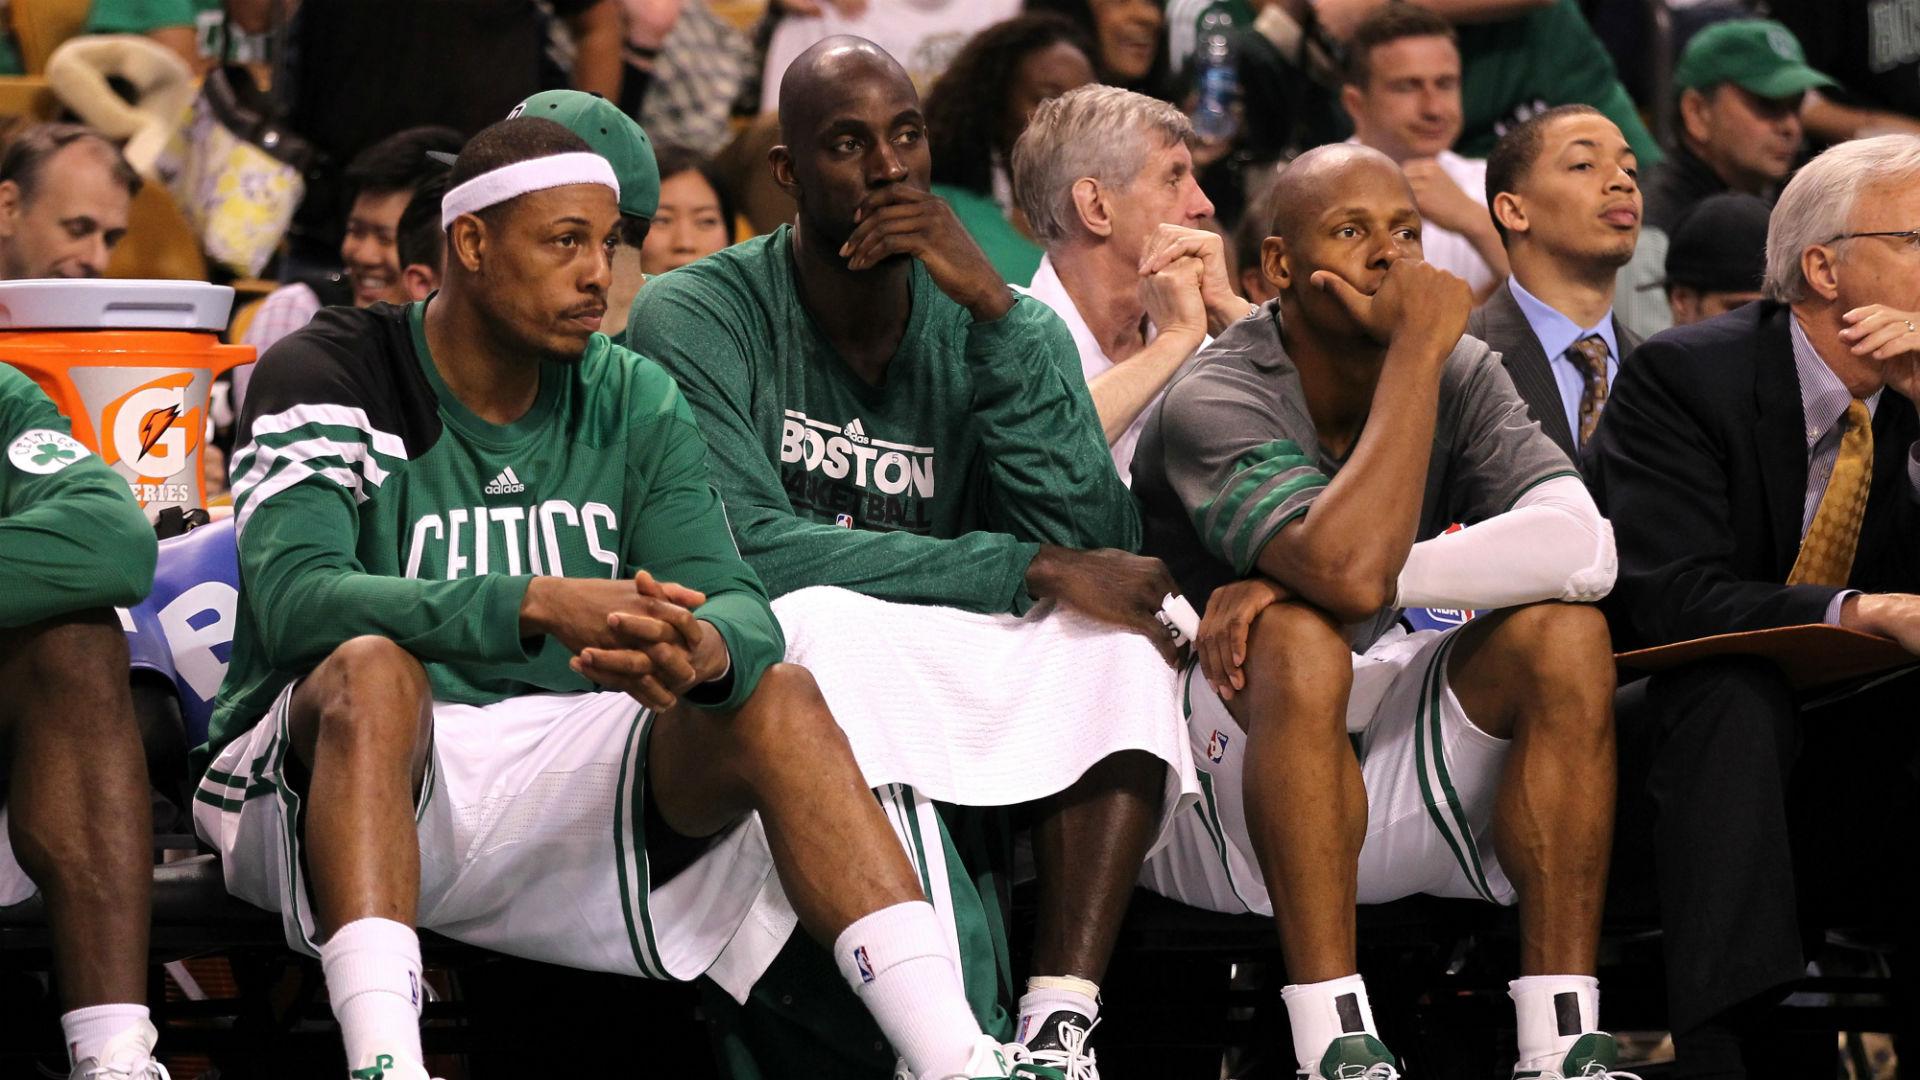 Boston Celtics won't invite Ray Allen to 2008 championship celebration